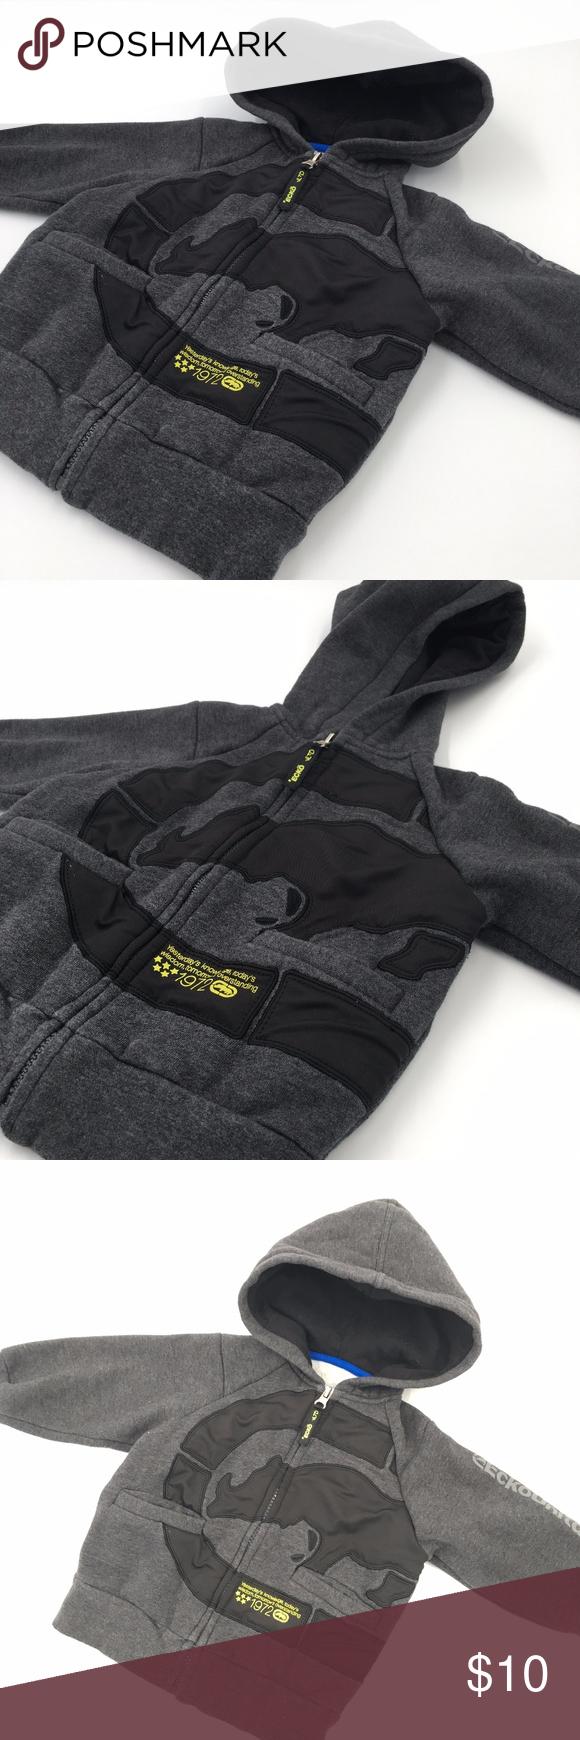 Ecko Ltd Infant Hooded Sweatshirt Hooded Sweatshirts Sweatshirts Sweatshirts Hoodie [ 1740 x 580 Pixel ]